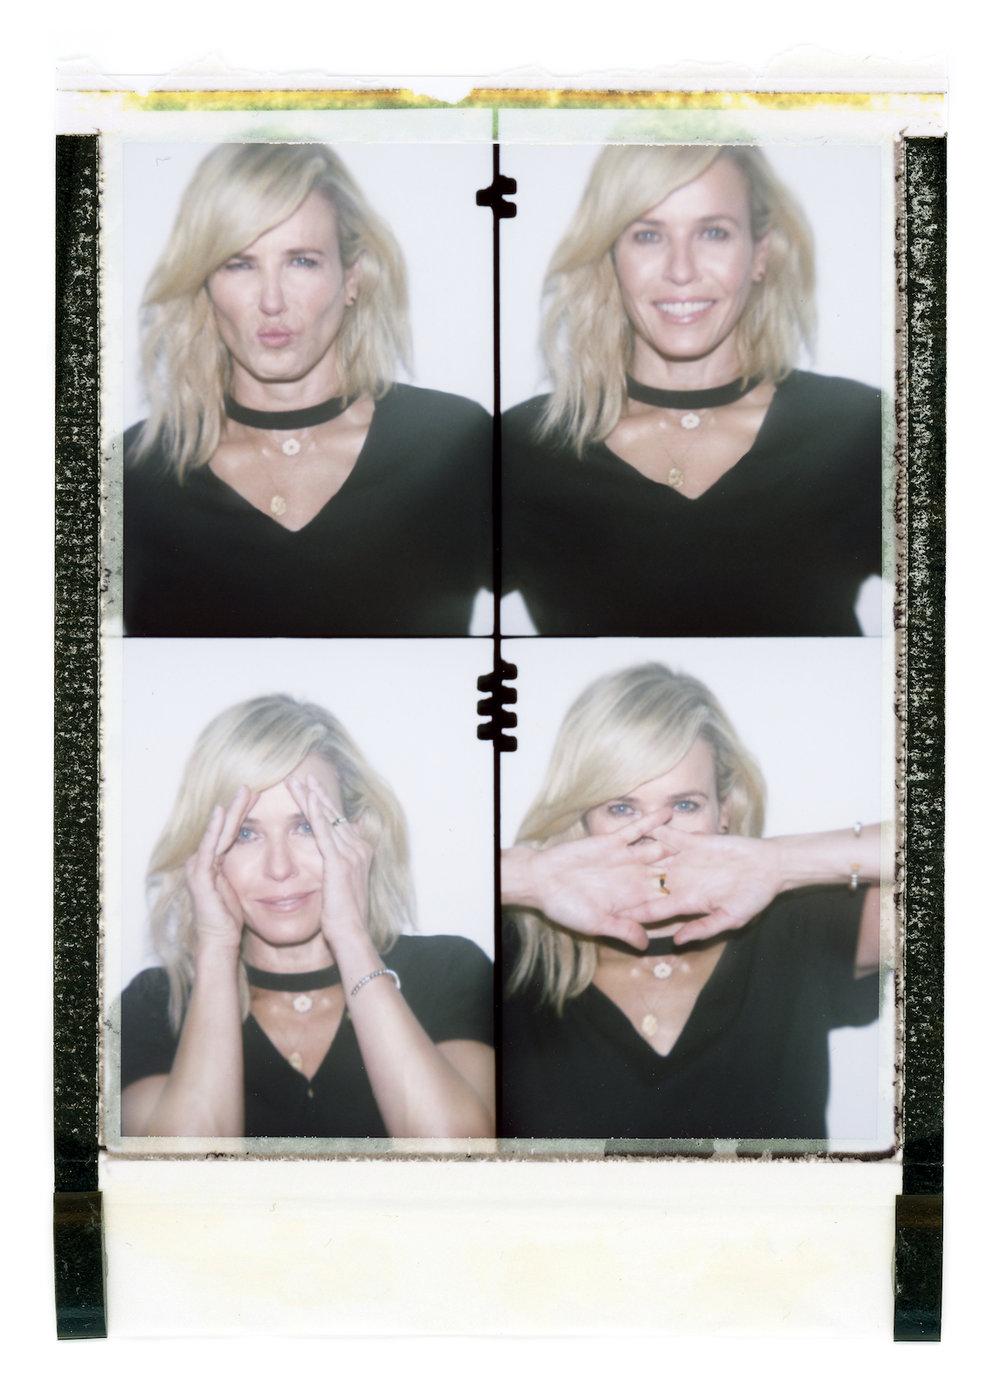 PLAYBOY_Chelsea Handler_Interview_Polaroid Collage1.jpeg